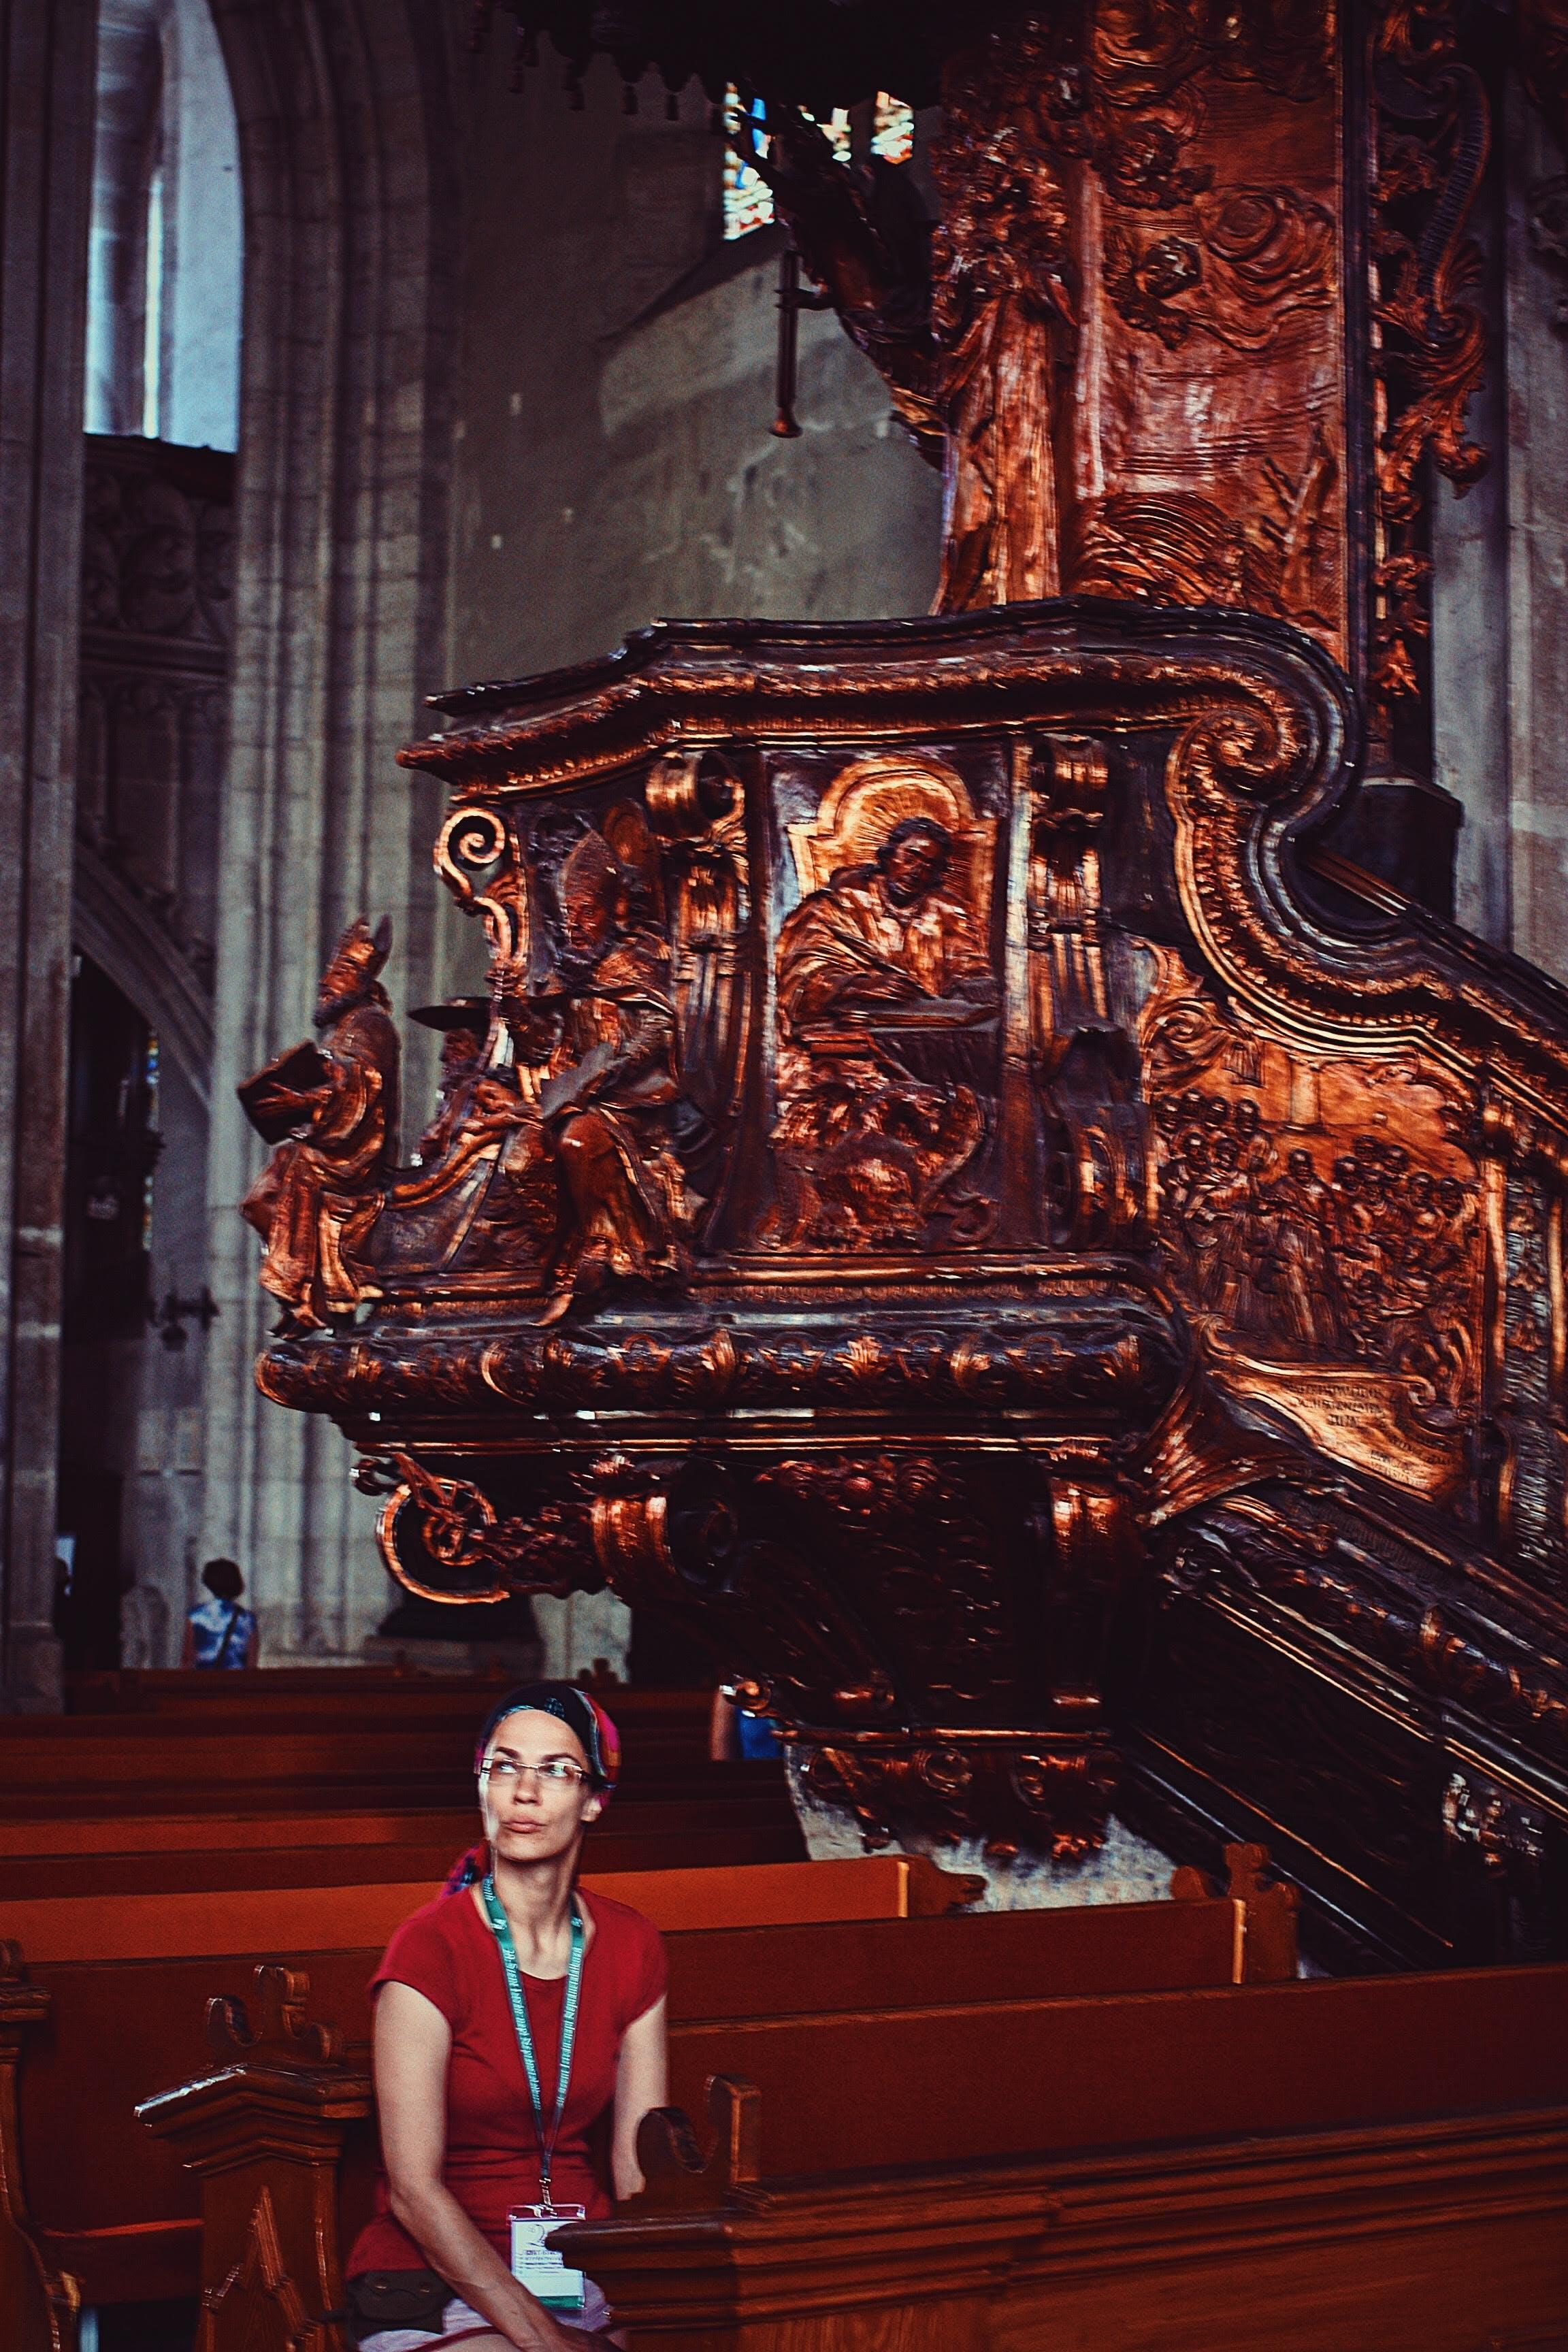 Fotos de stock gratuitas de Iglesia